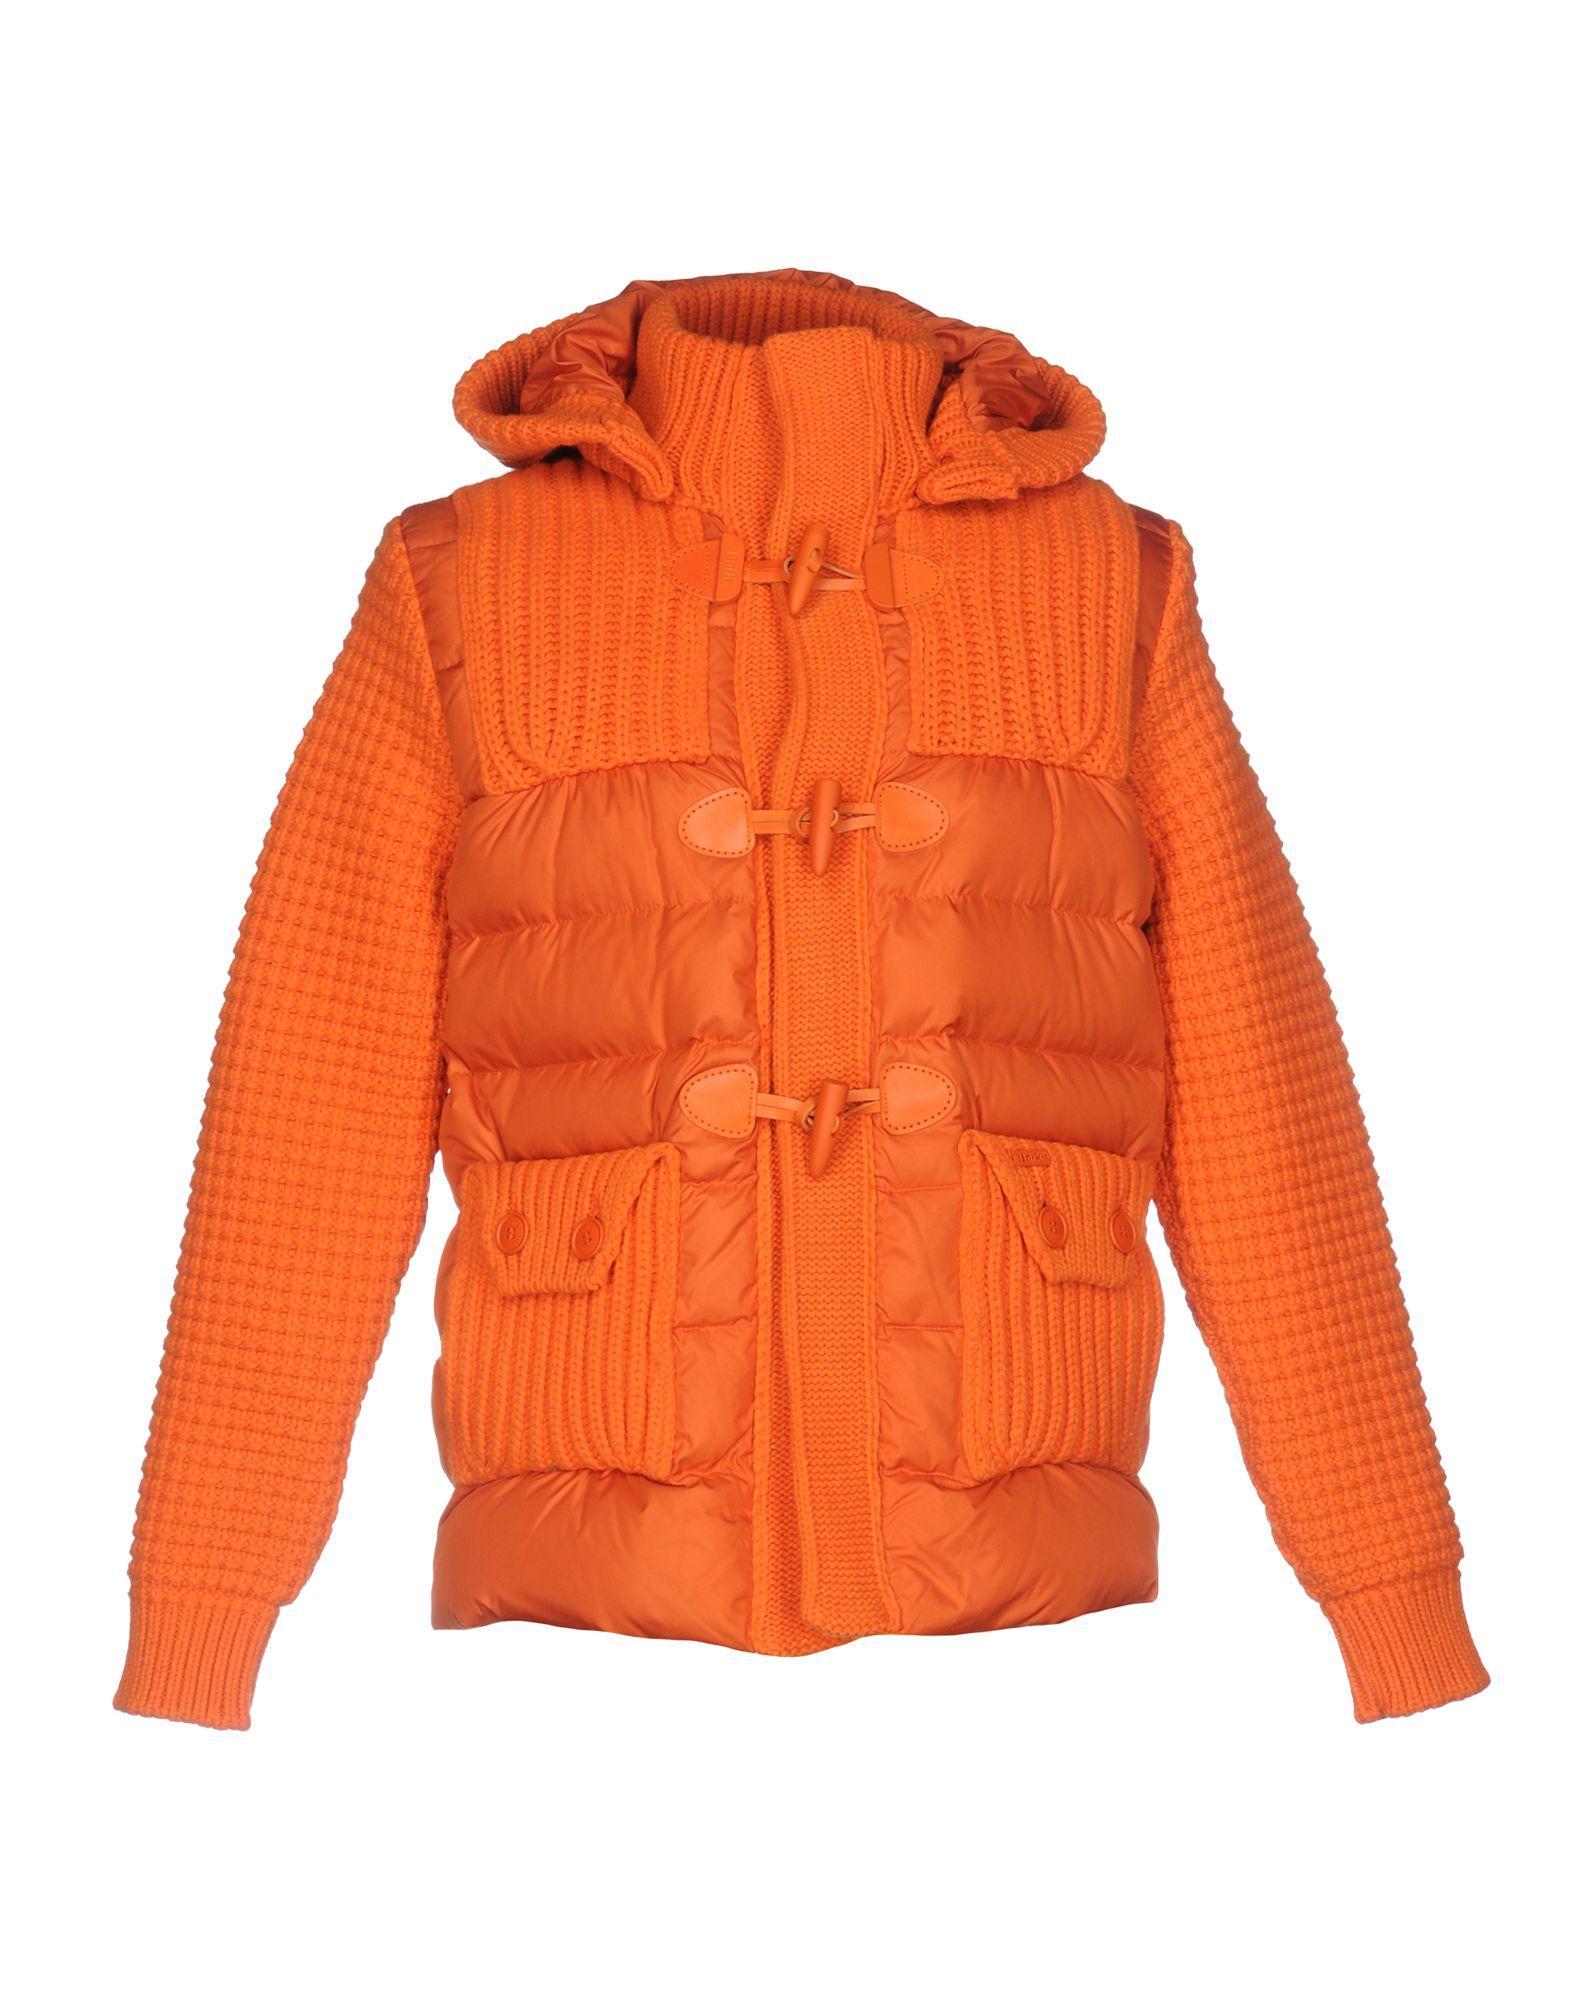 Bark Down Jackets In Orange